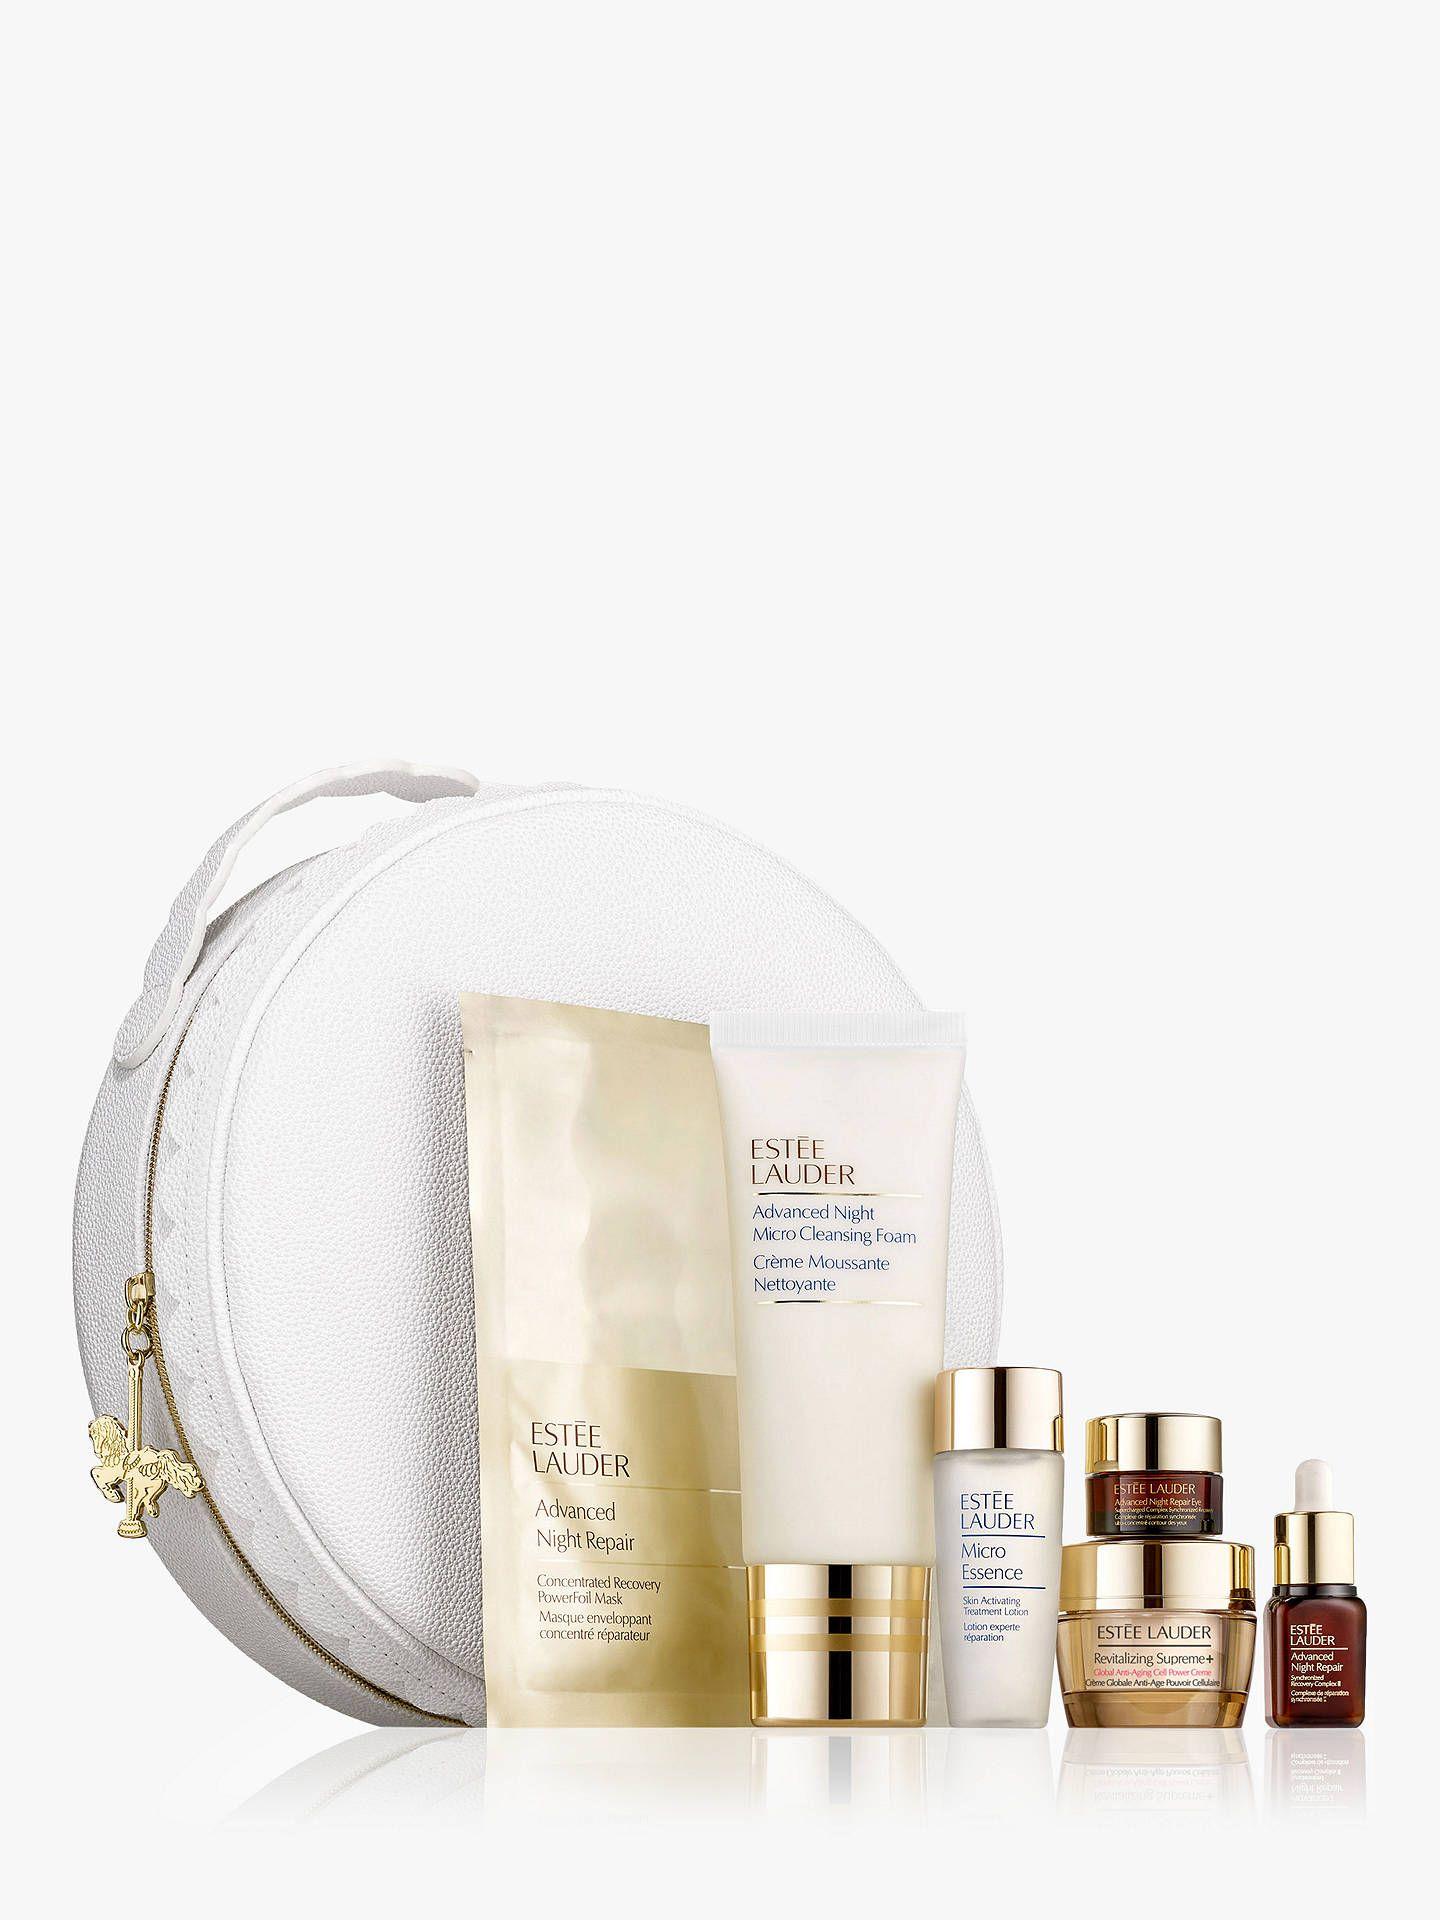 Estée Lauder Beauty of the Night Skincare Gift Set